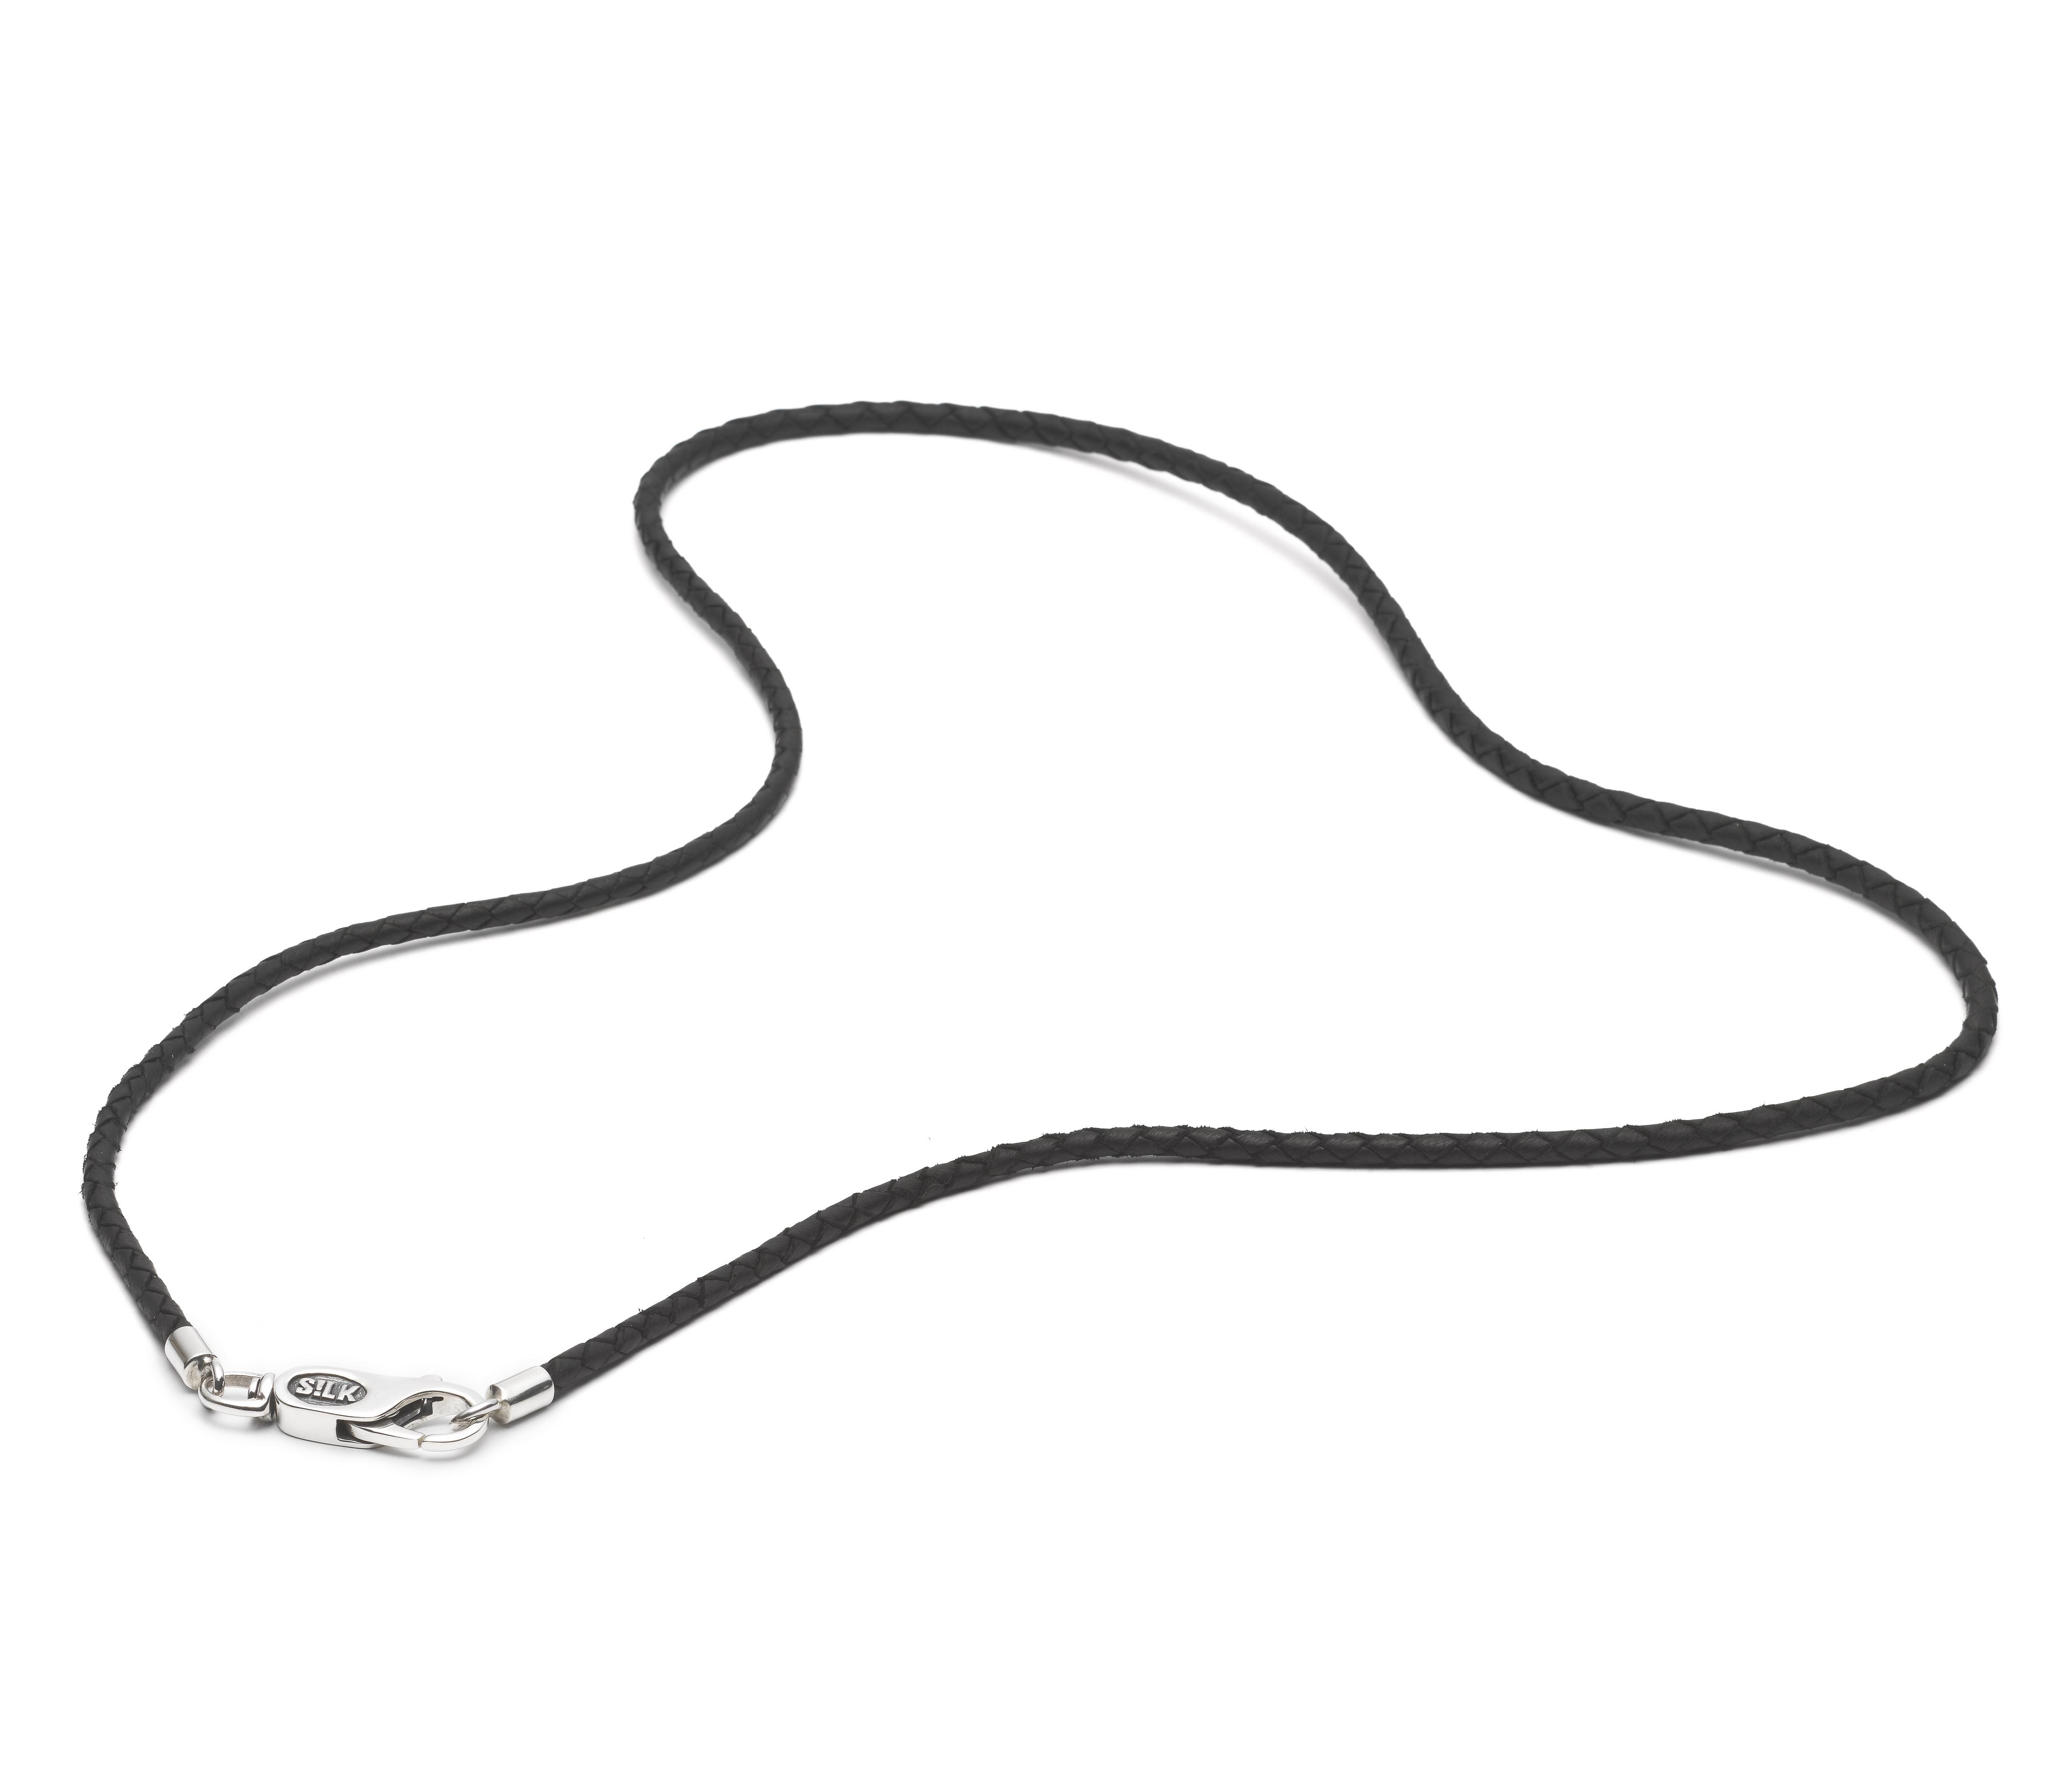 SILK Jewellery 820BLK.21 Armband zilver-leder zwart 21 cm